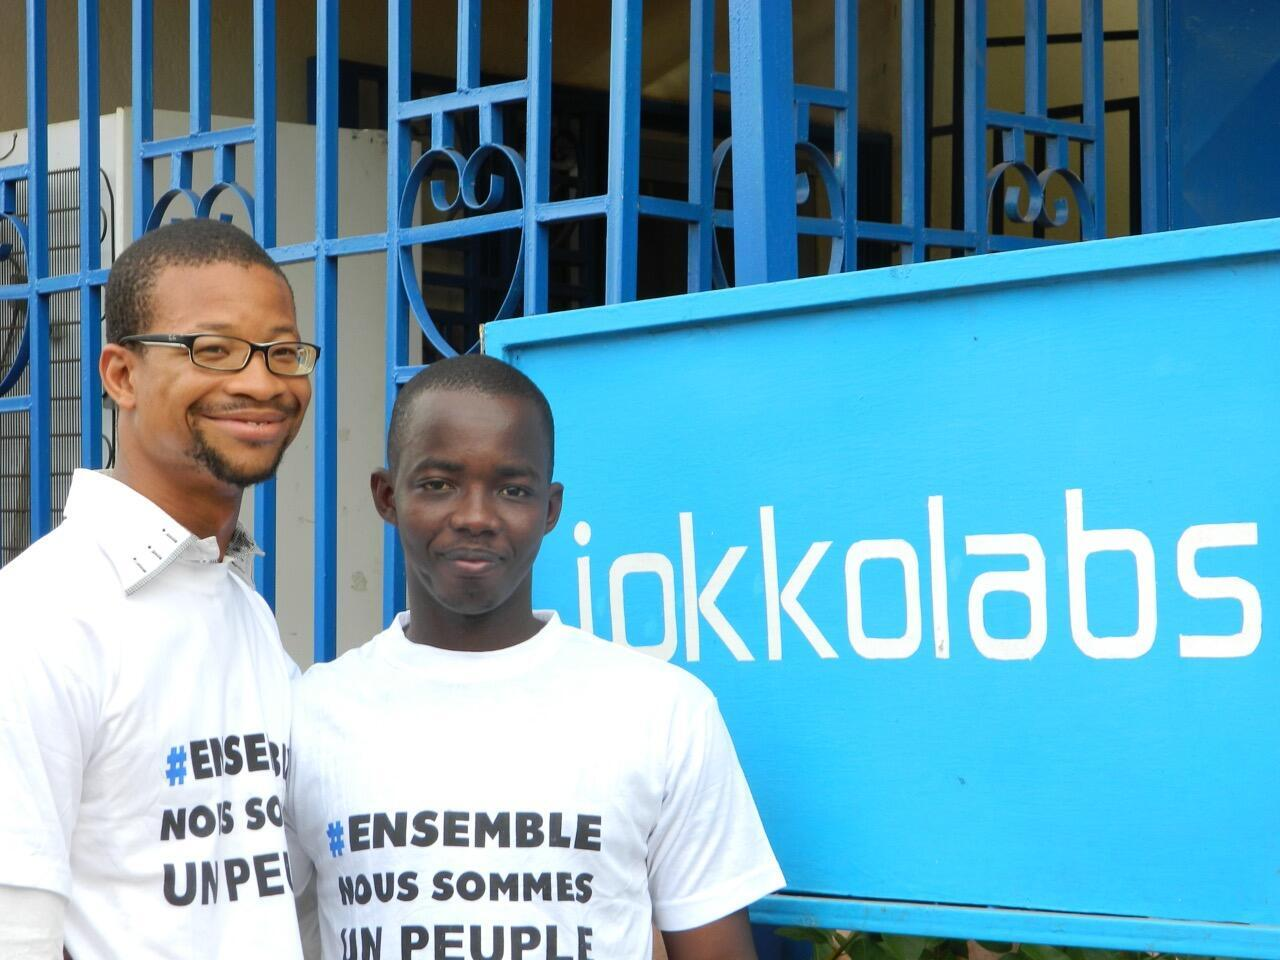 Jokkolabs Bamako workers Alou Dolo and Arboncana Touré in happier times